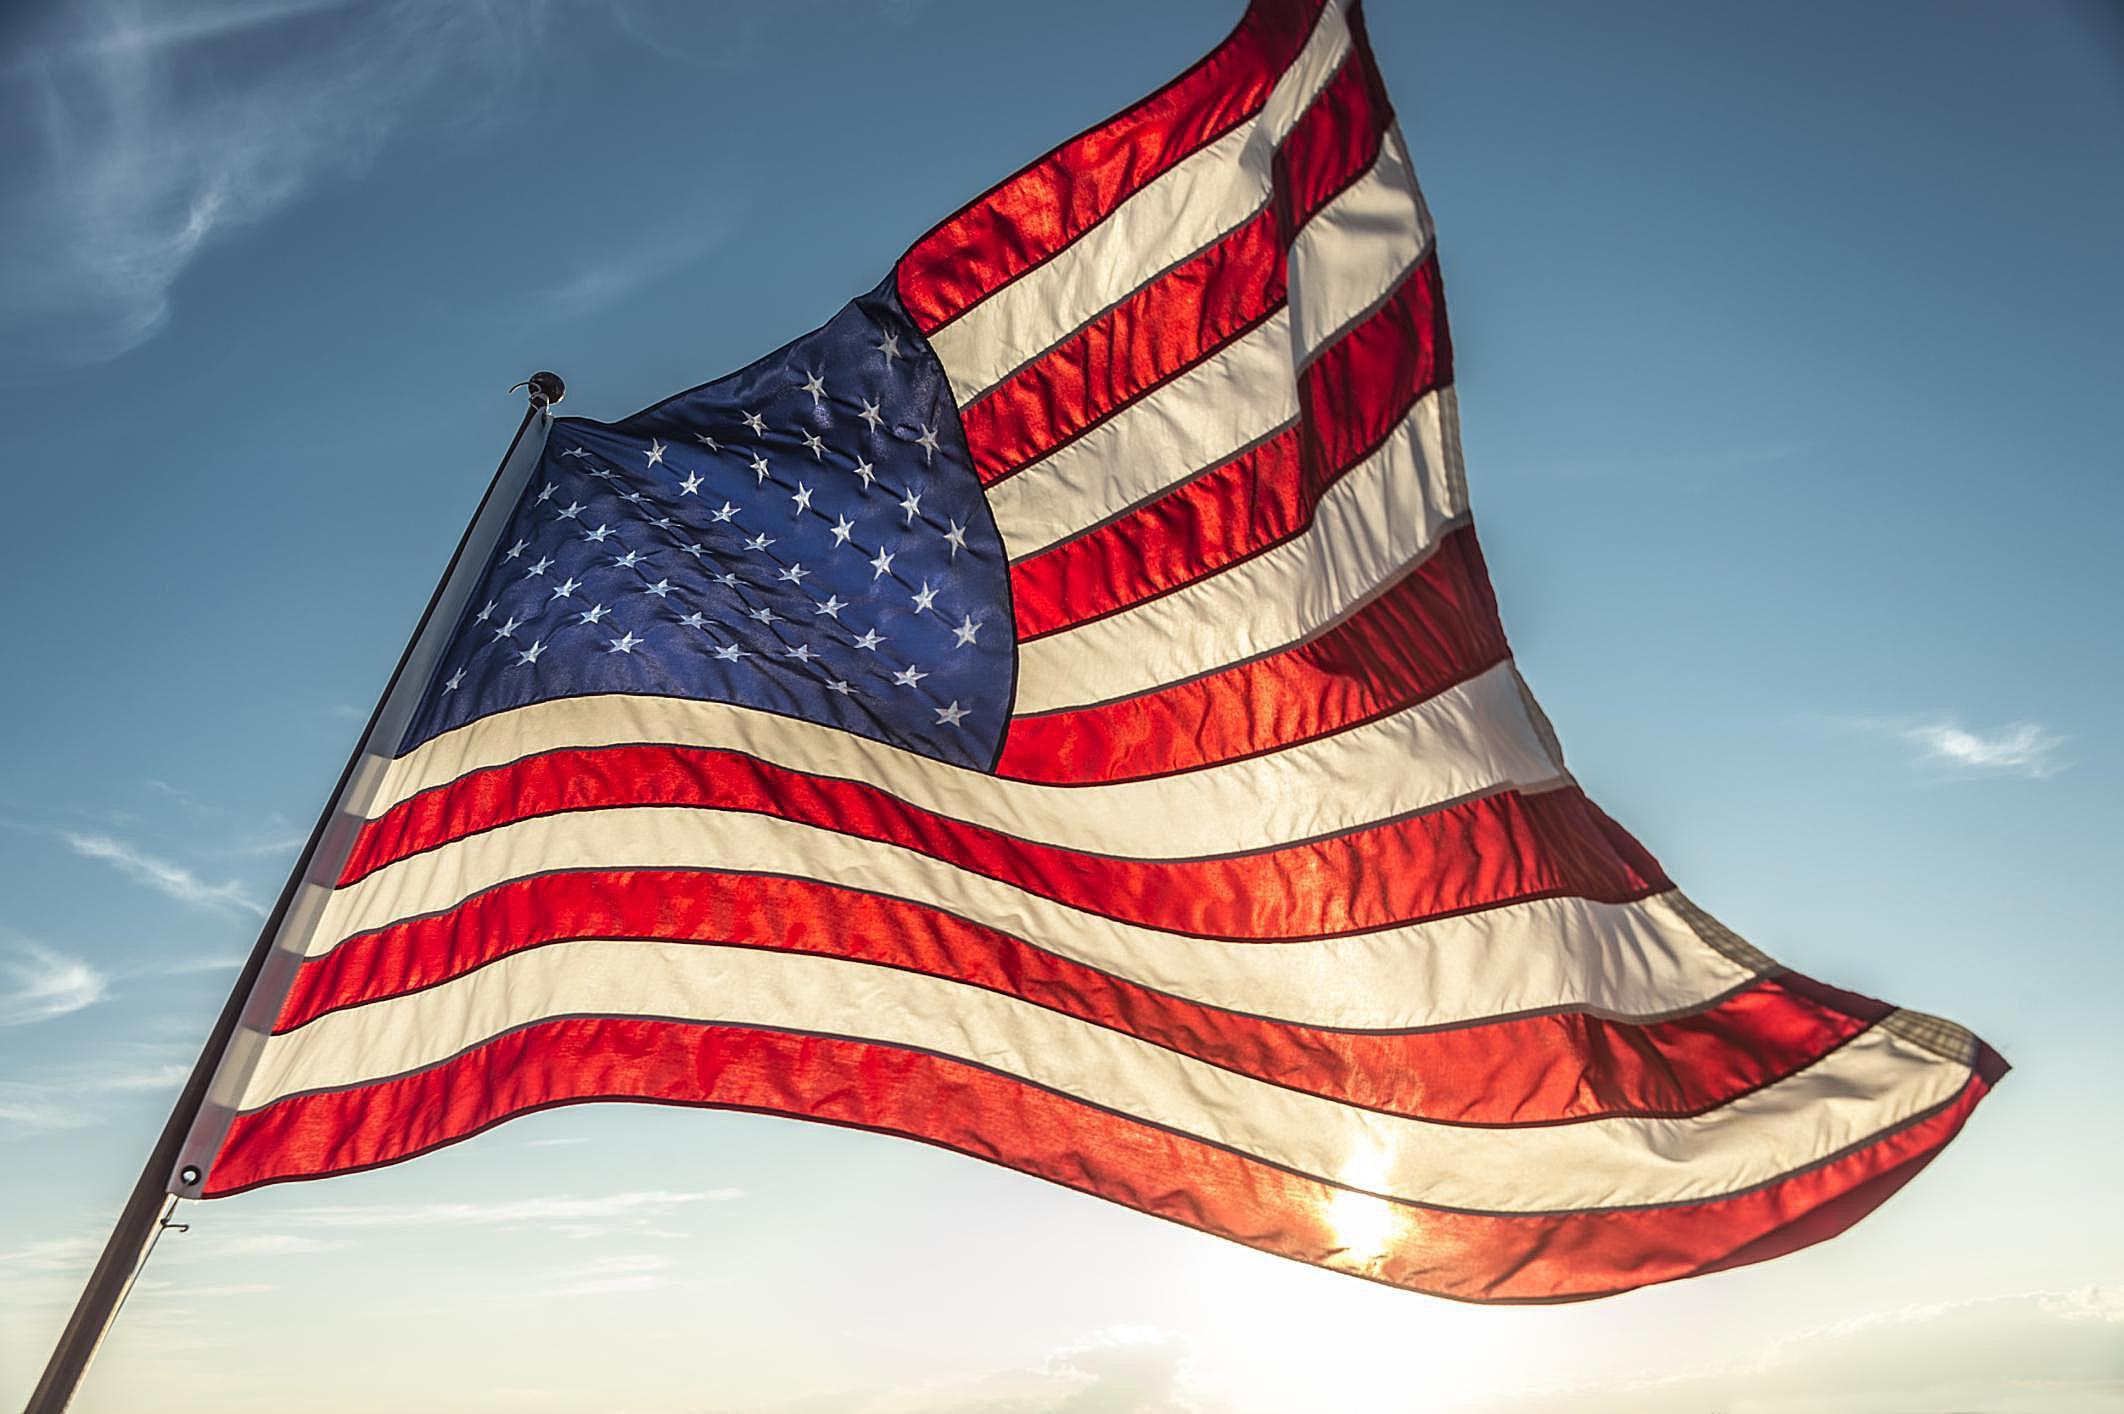 Usa Flag Wallpaper Iphone 6 American Flag Wallpapers Hd Pixelstalk Net